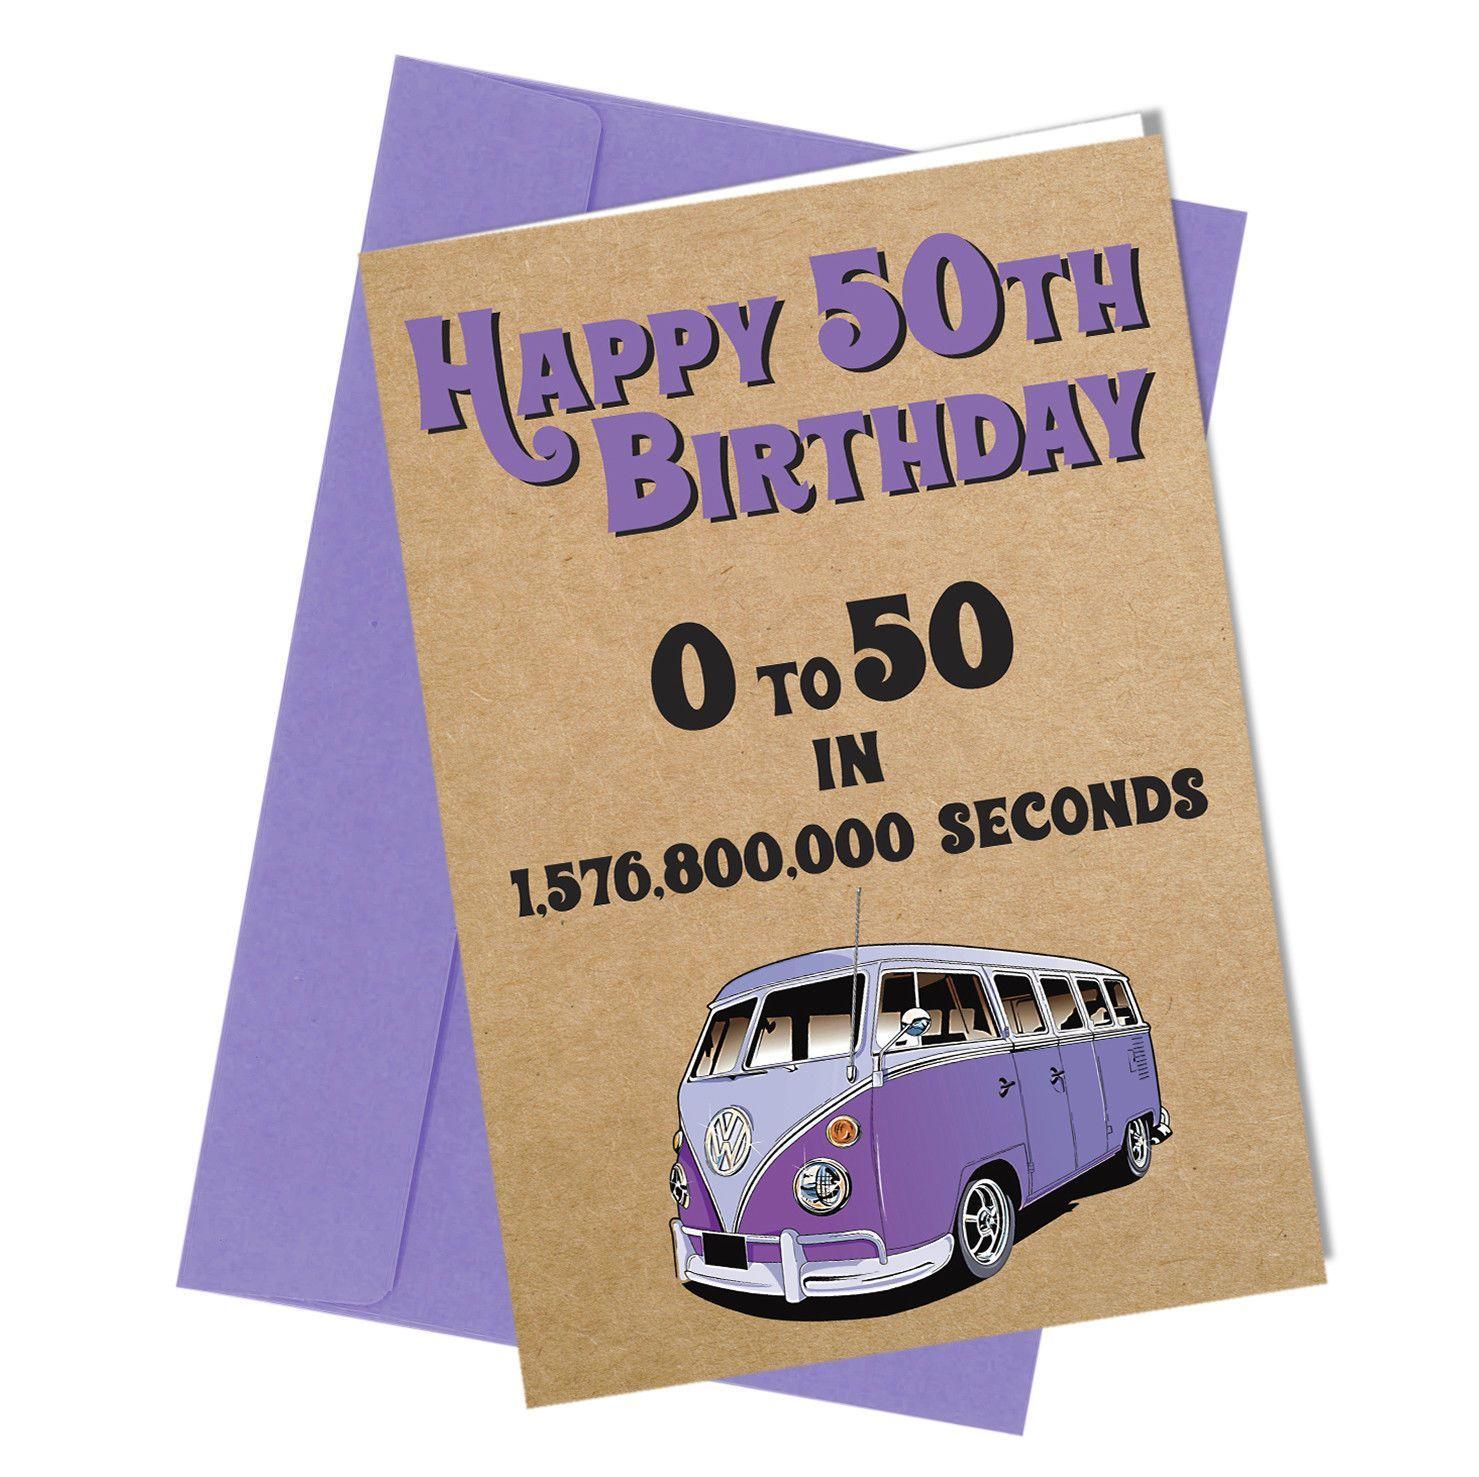 Seconds - #324 50th Birthday